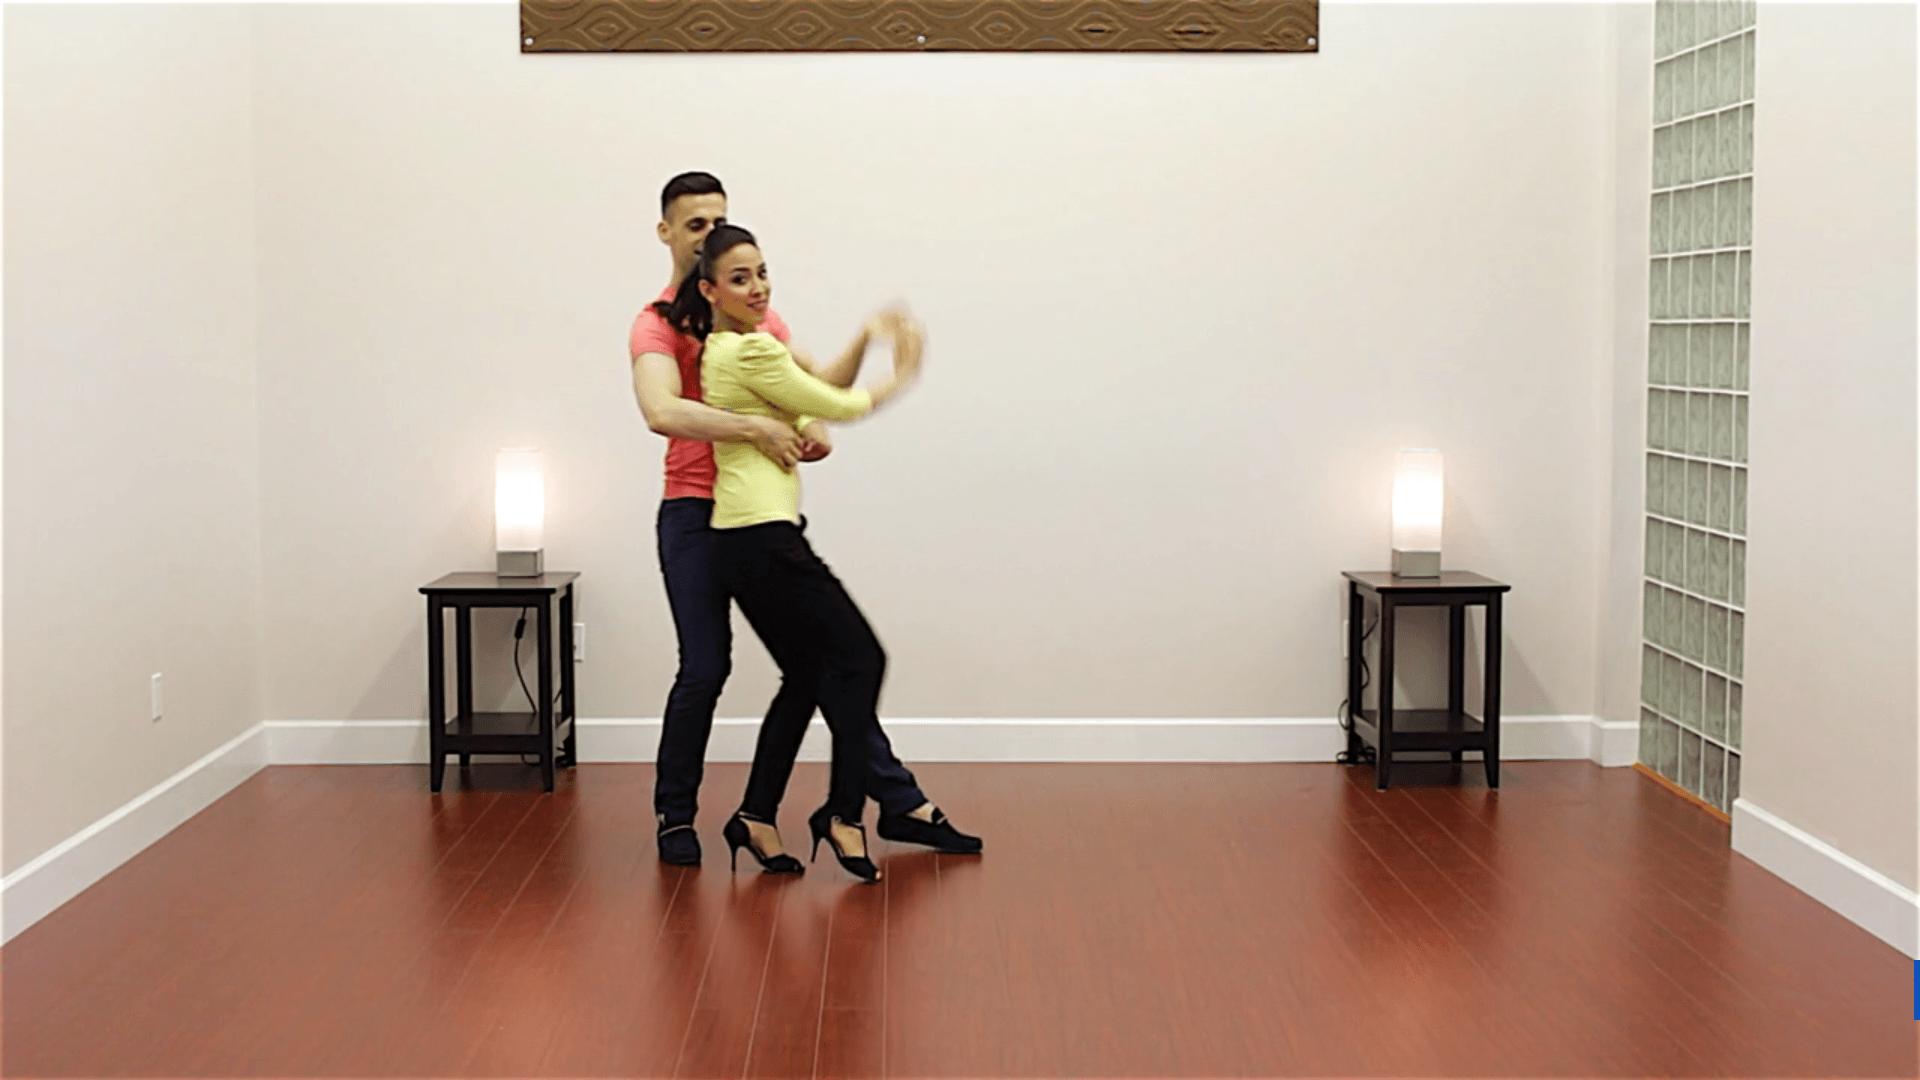 Advanced Salsa pattern Buena Onda by Dance Dojo